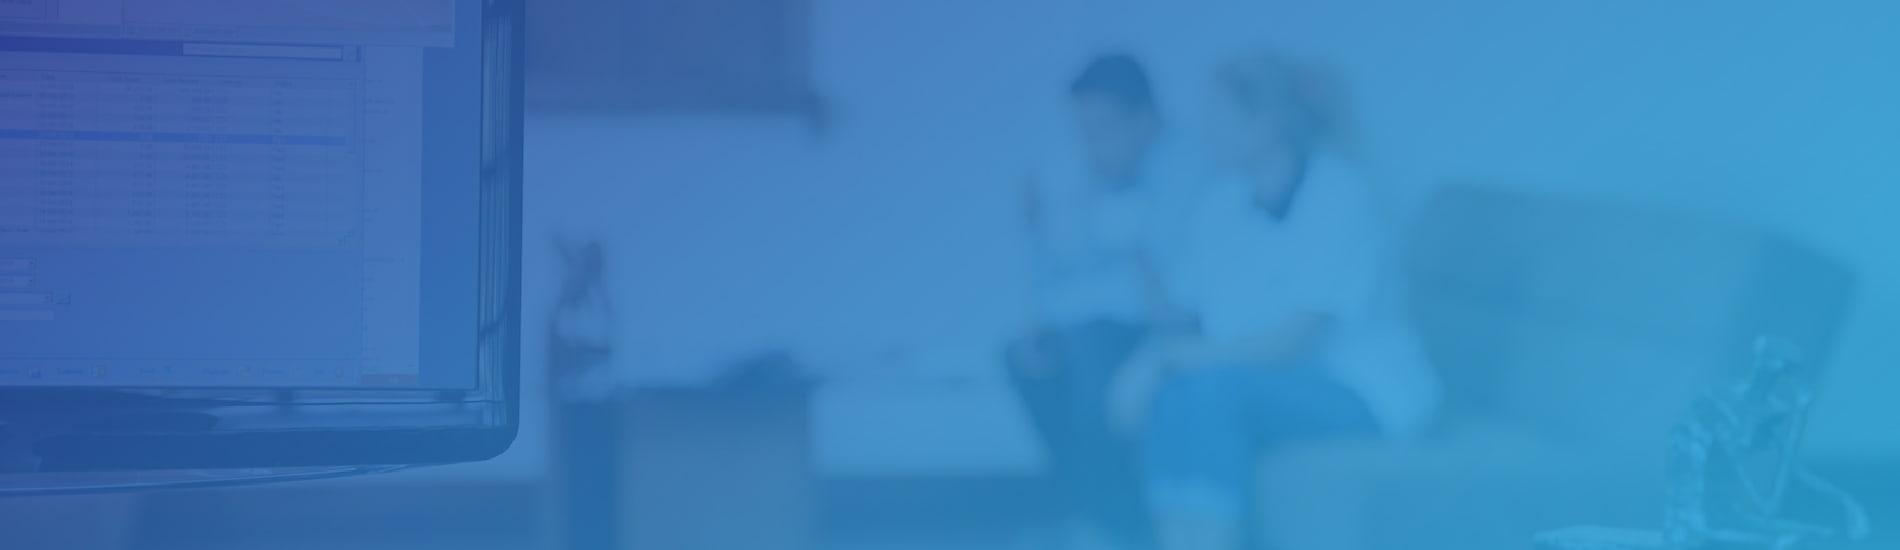 Service banner for EXACT software ltd